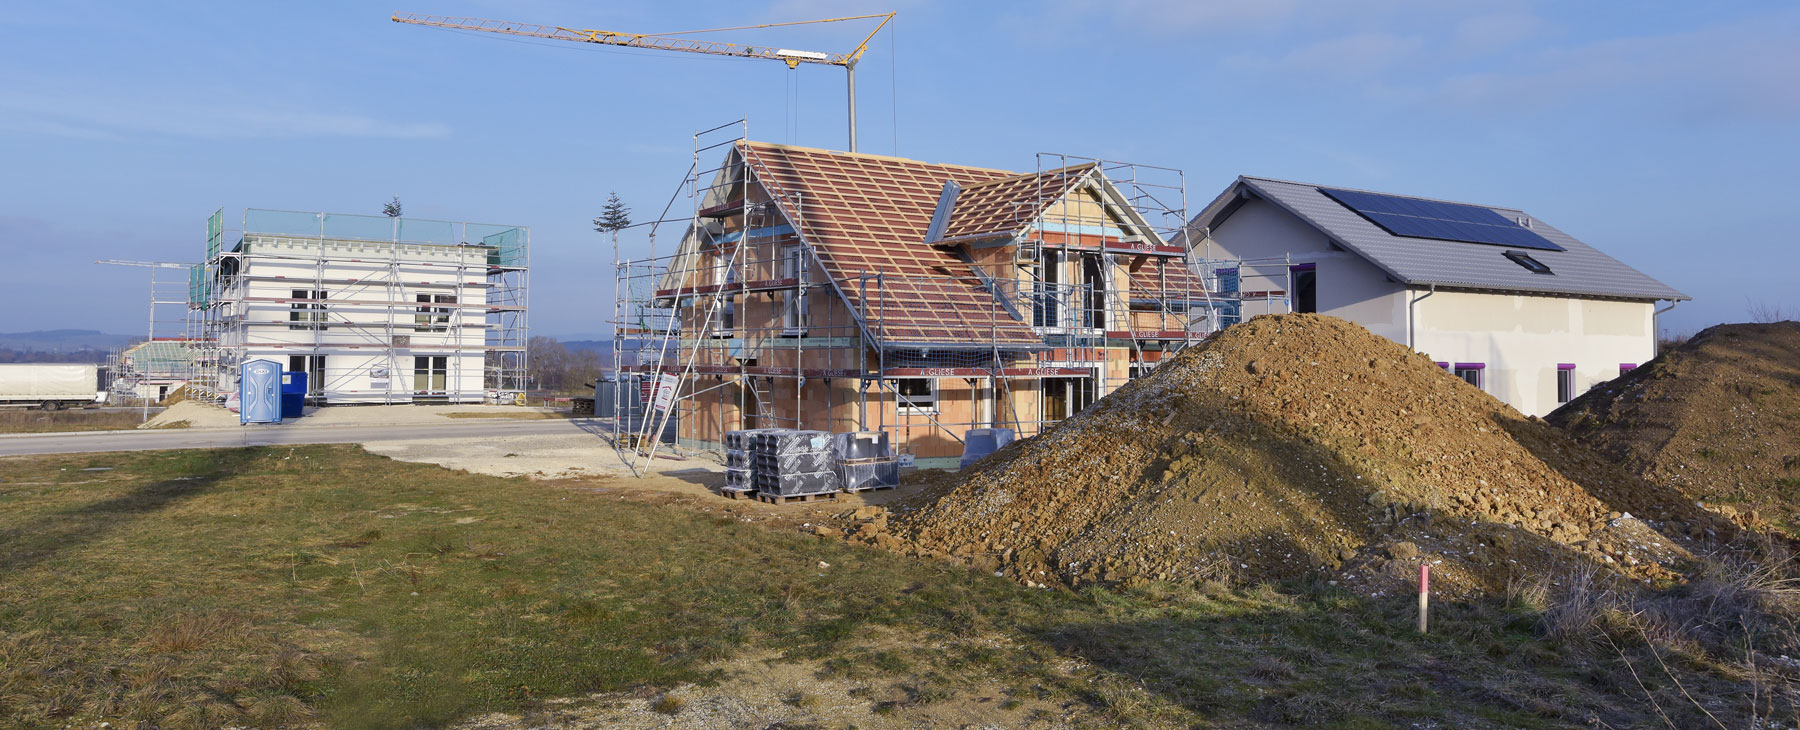 Baugebiet